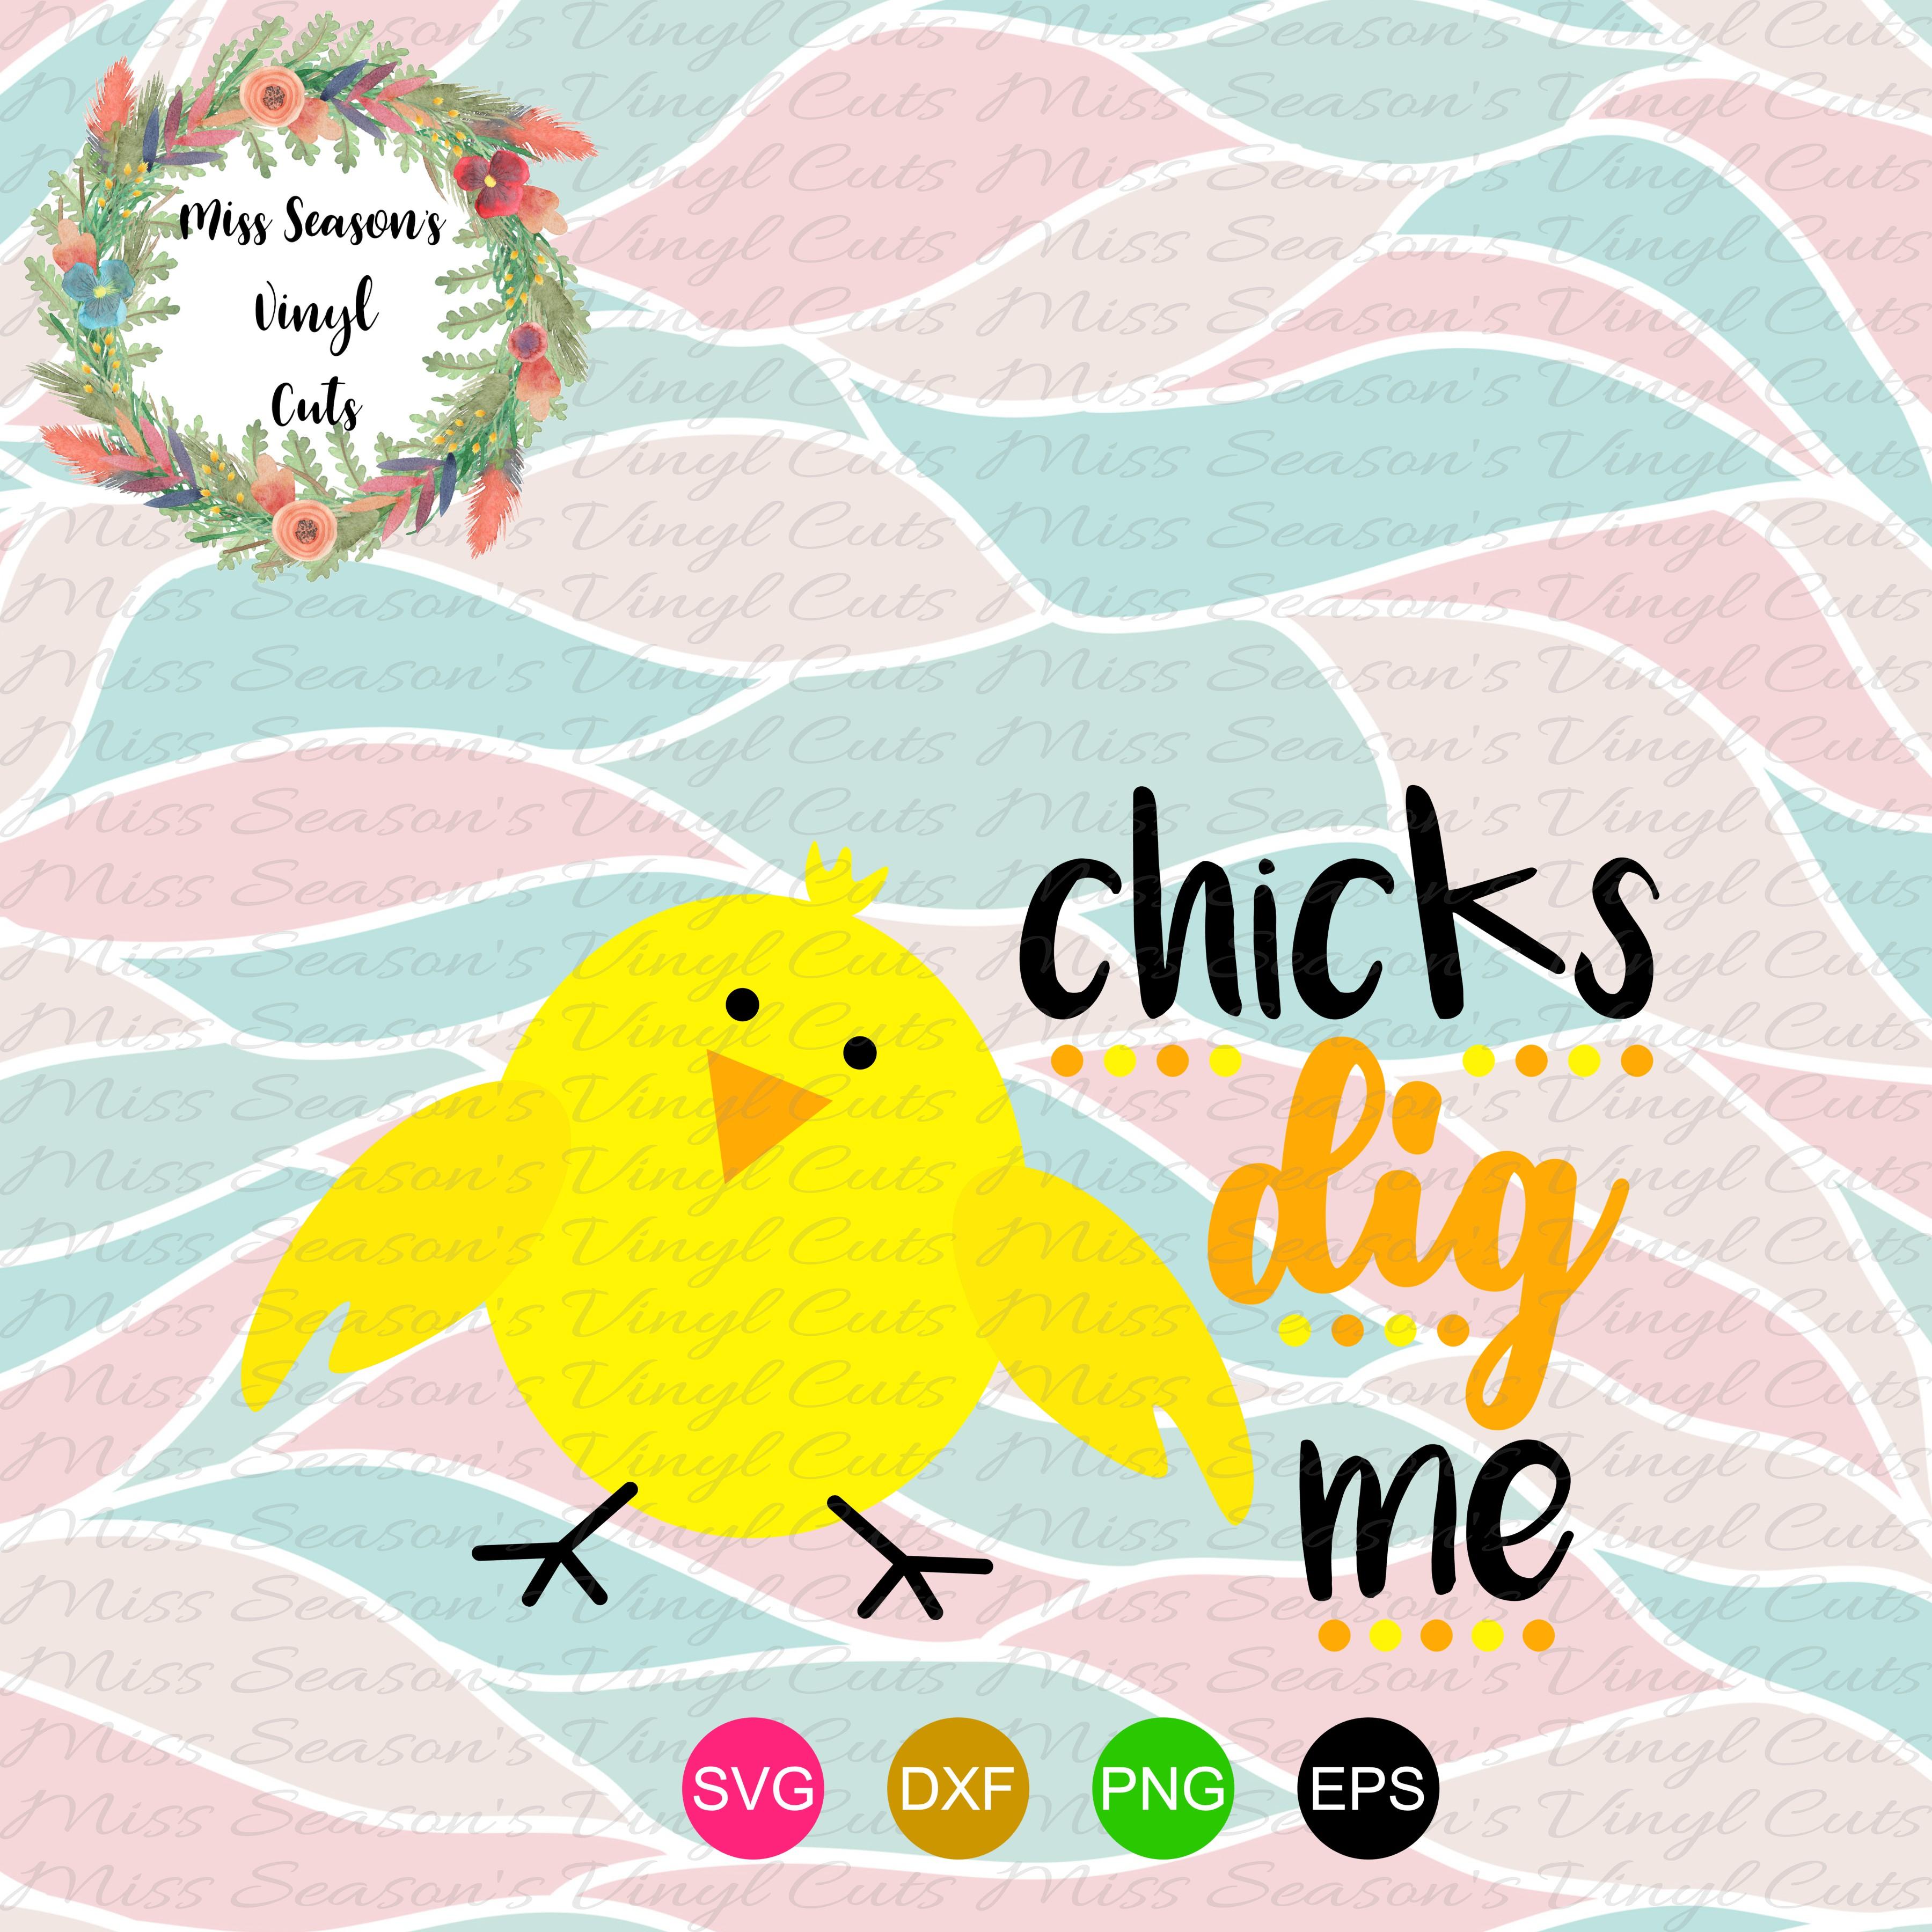 Chicks Dig Me SVG  example image 1